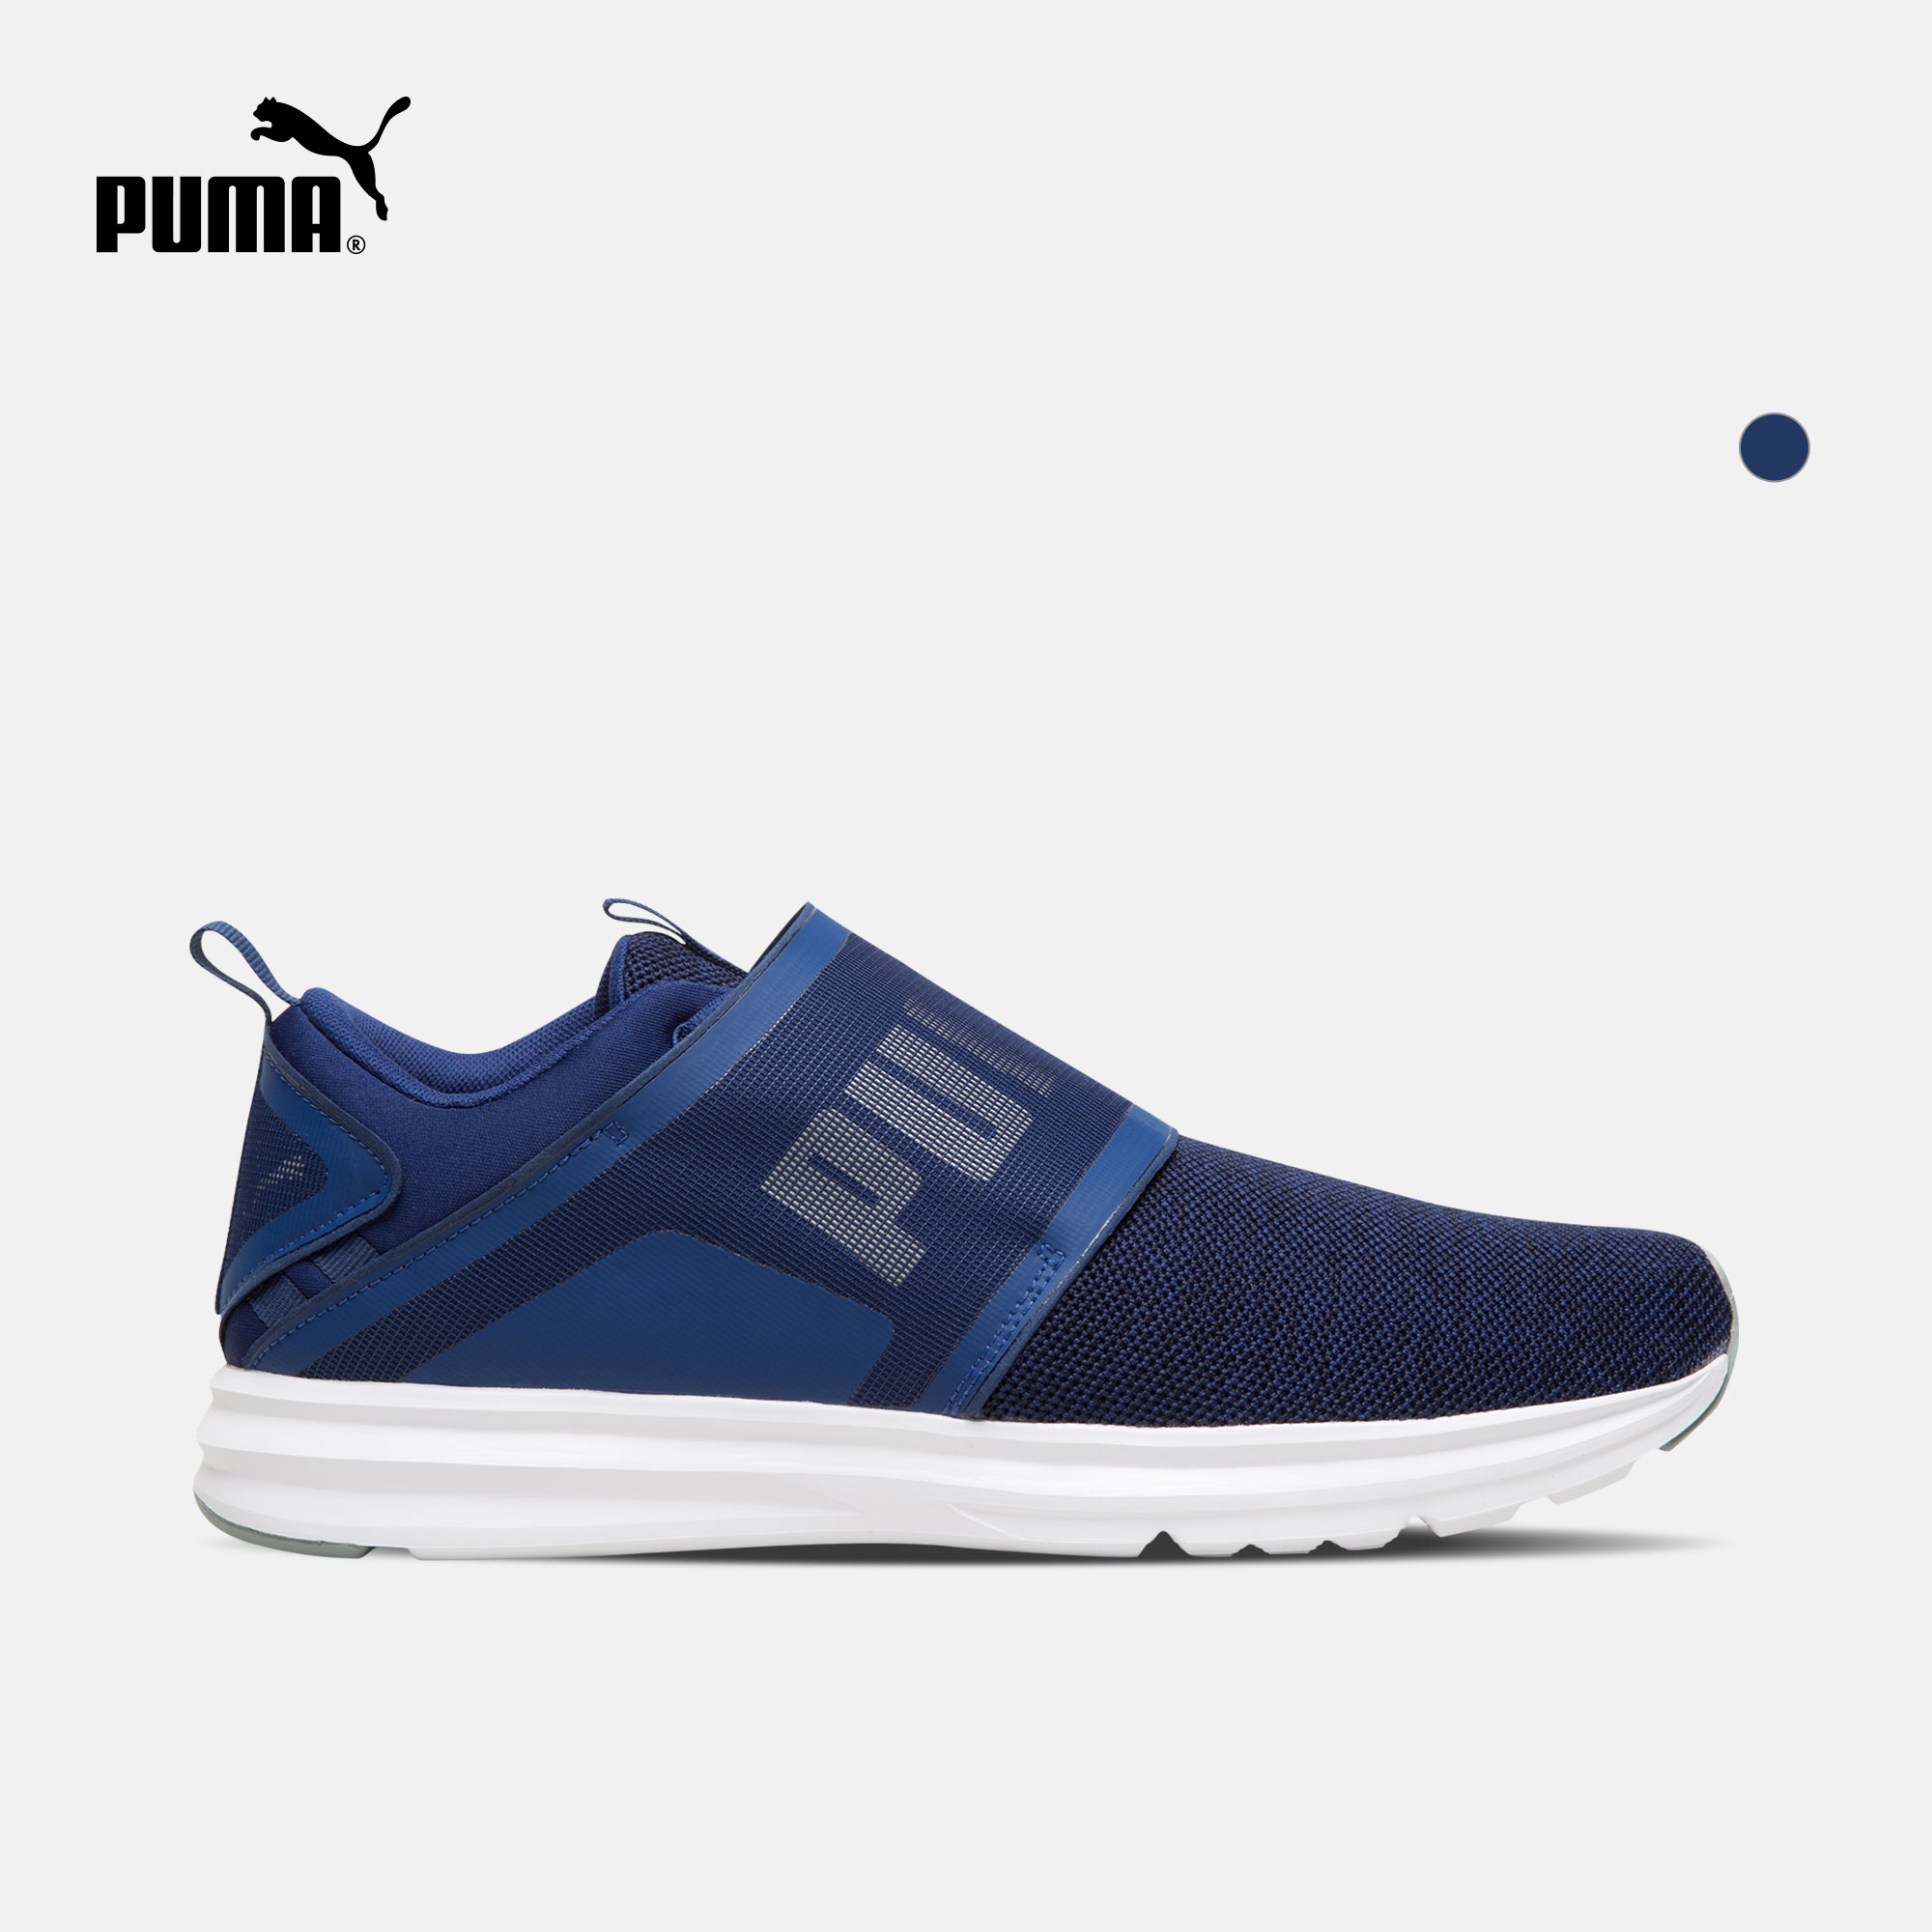 PUMA彪马官方 男子跑步鞋 Enzo Strap Knit 190029